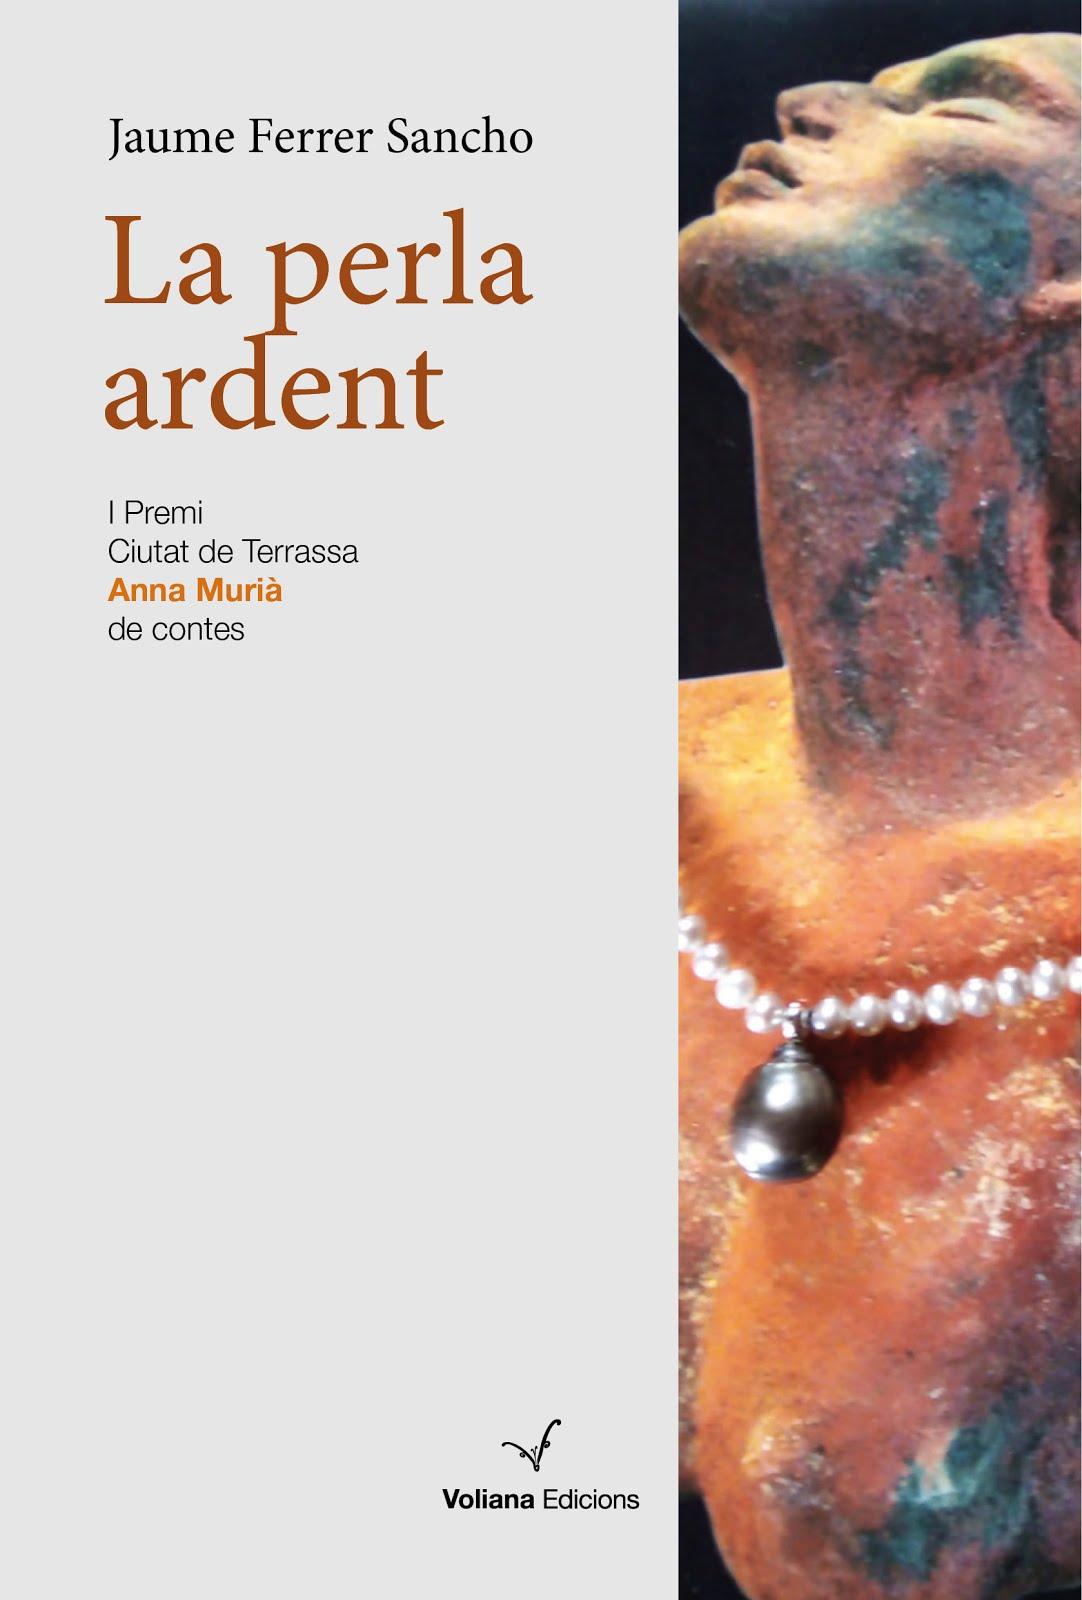 La perla ardent, Jaume Ferrer